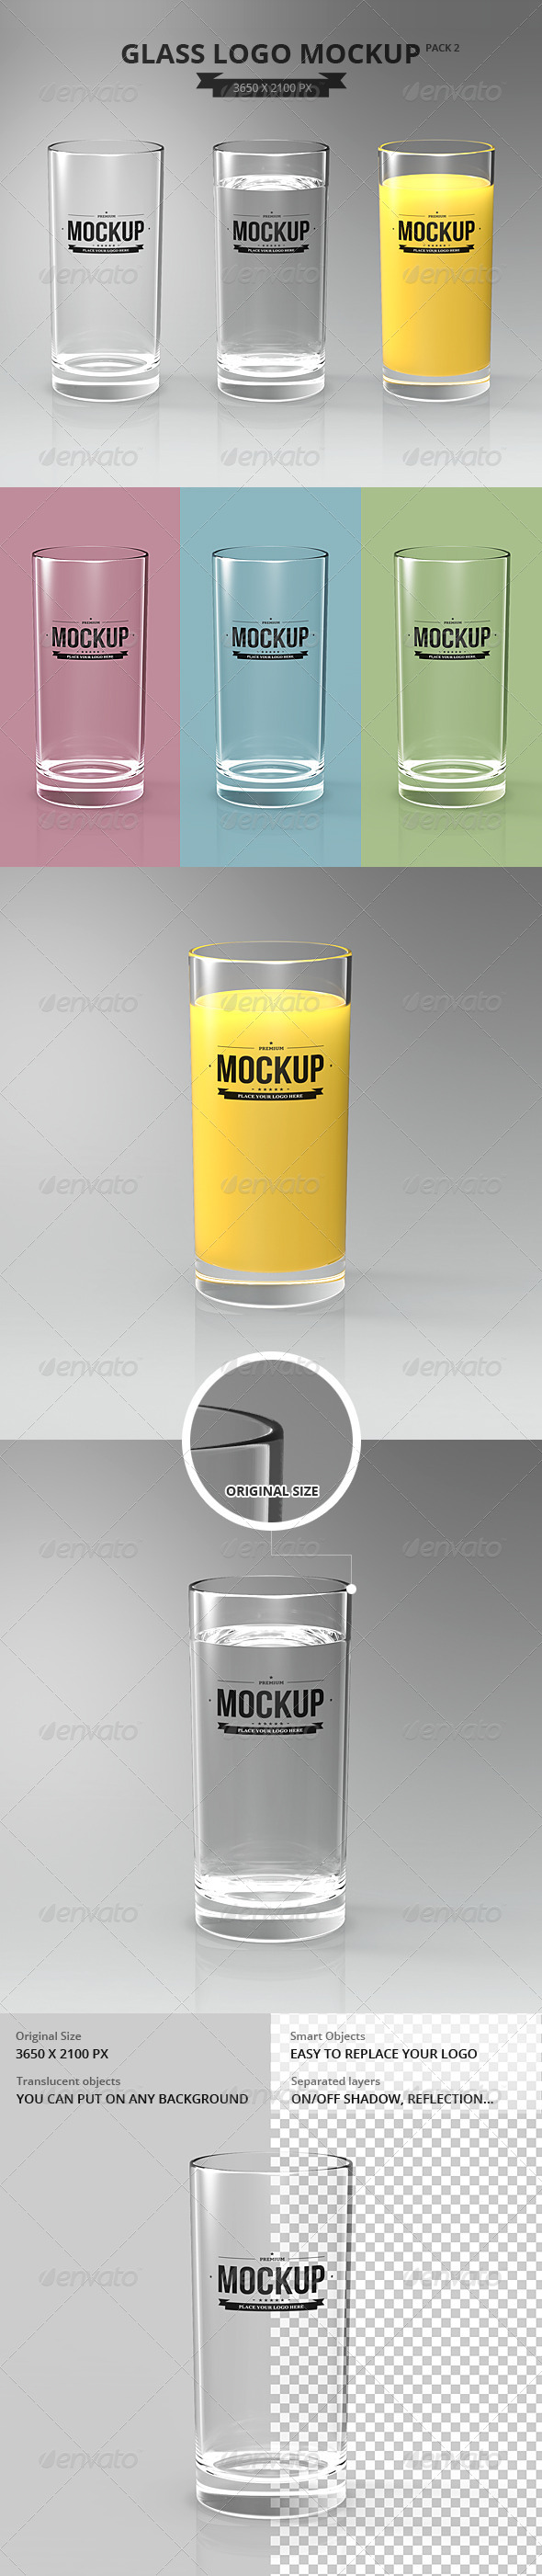 GraphicRiver Glasses Logo Mockup Pack 2 7301861